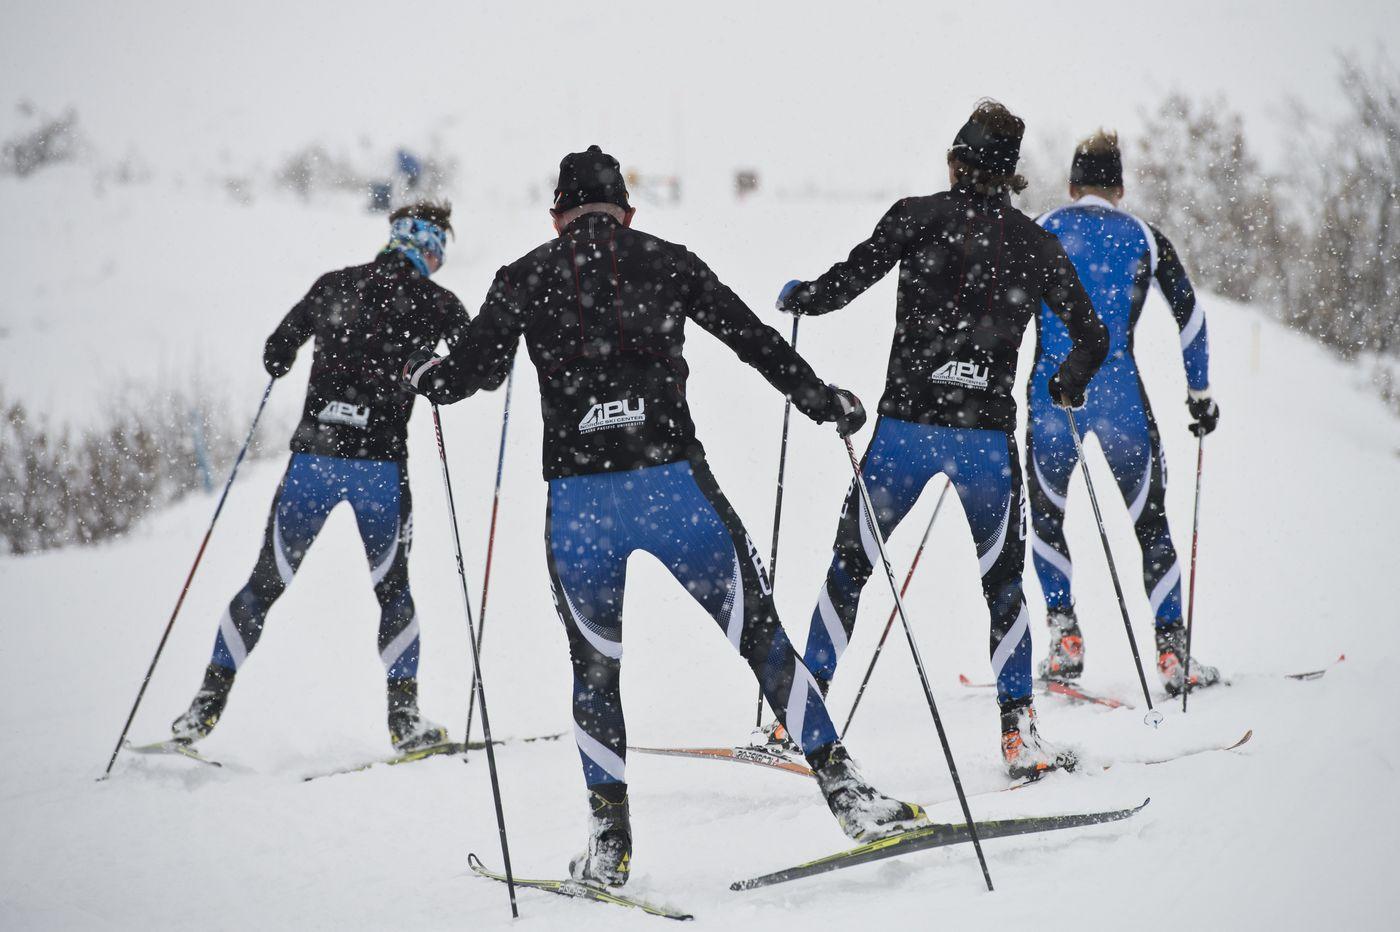 From left are Thomas O'Harra, Forrest Mahlen, Scott Patterson and Erik Bjornsen.(Marc Lester / Alaska Dispatch News)